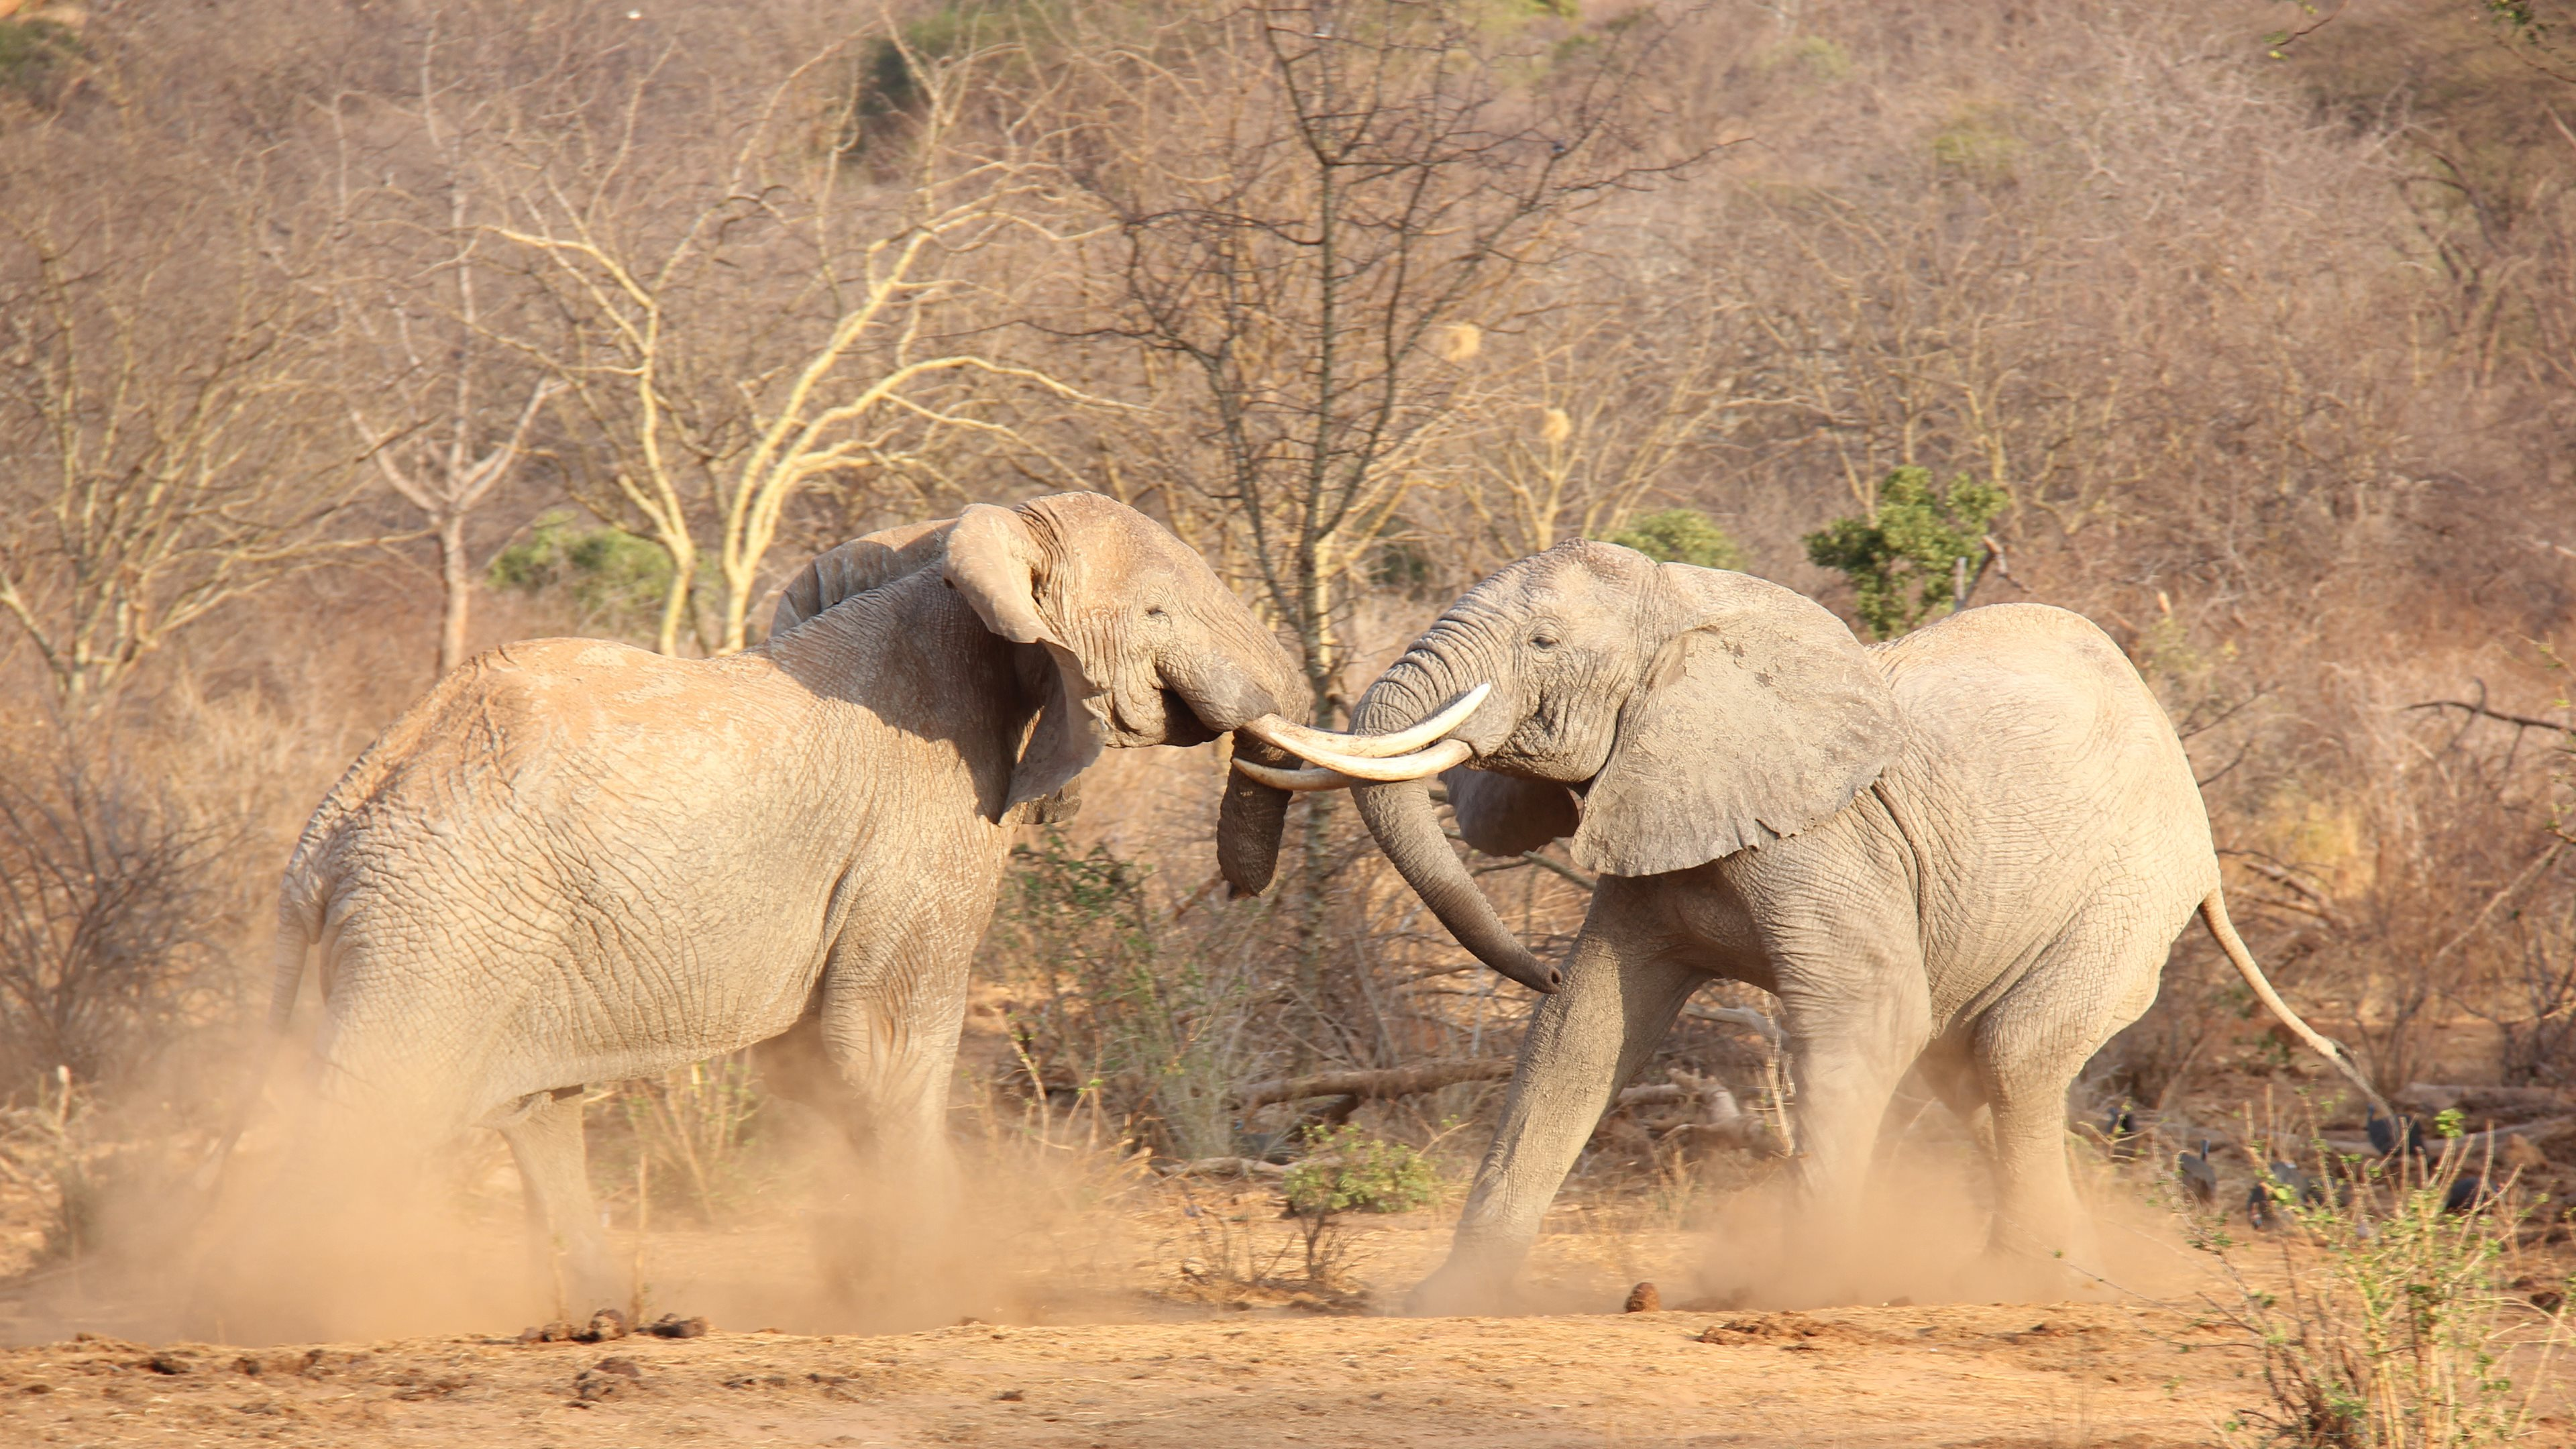 Must see Wallpaper High Quality Elephant - 4K-Elephant-Wallpaper-Gallery  Pic_463961.jpg